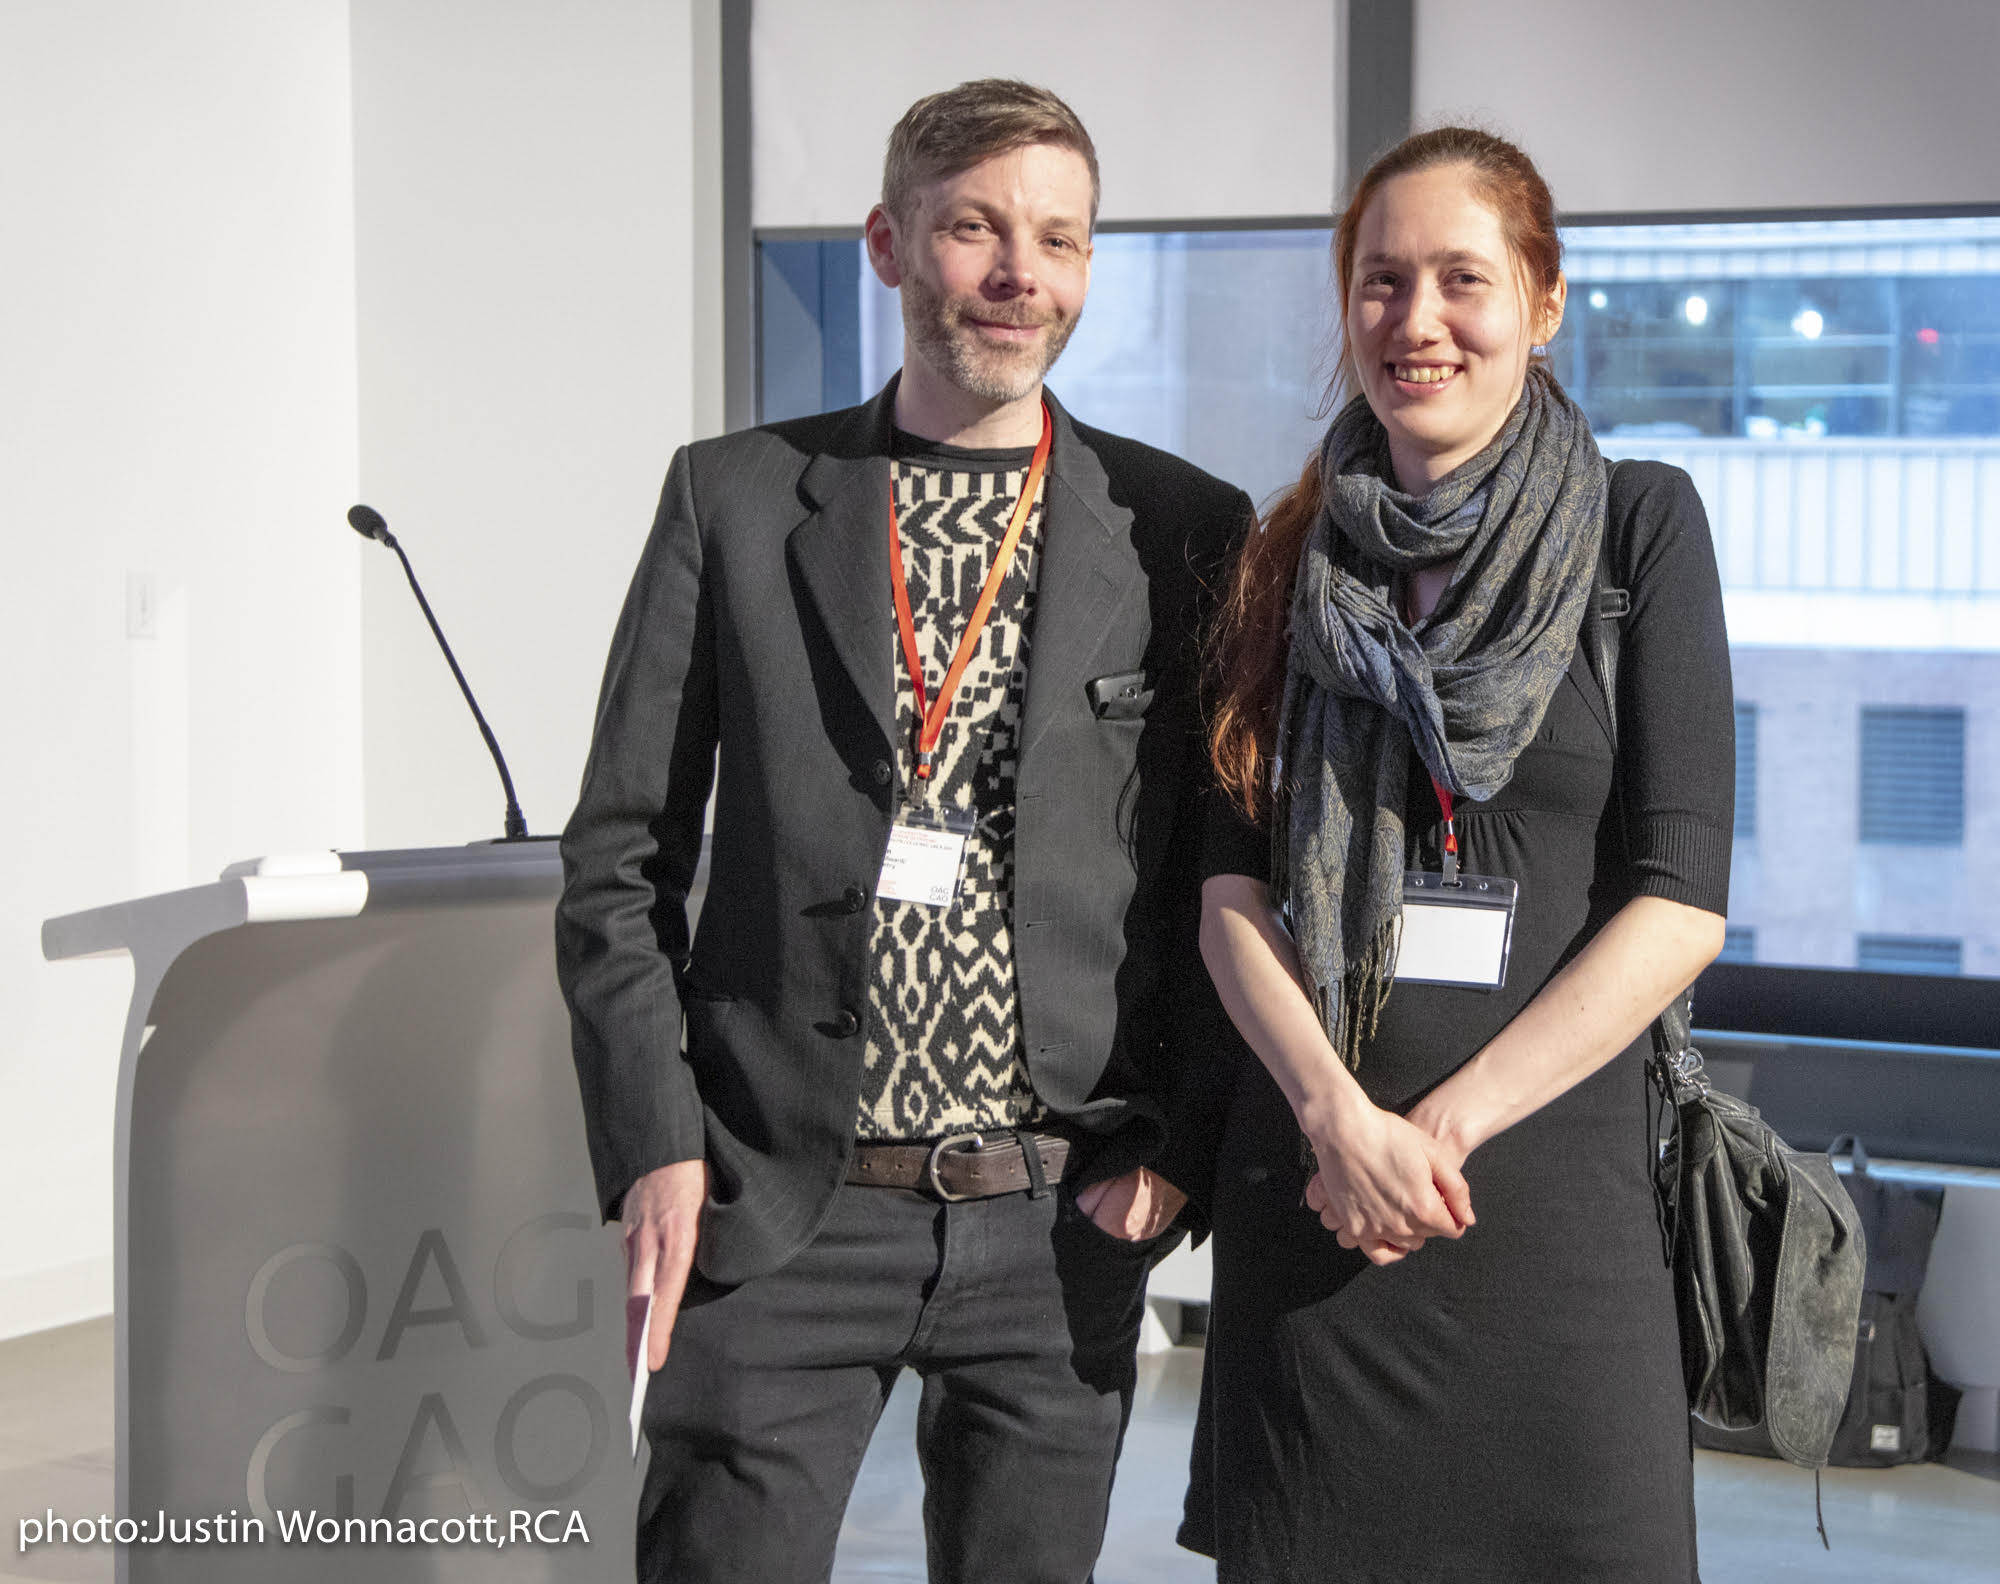 Adam Alexander Gunn and Karine Fréchette